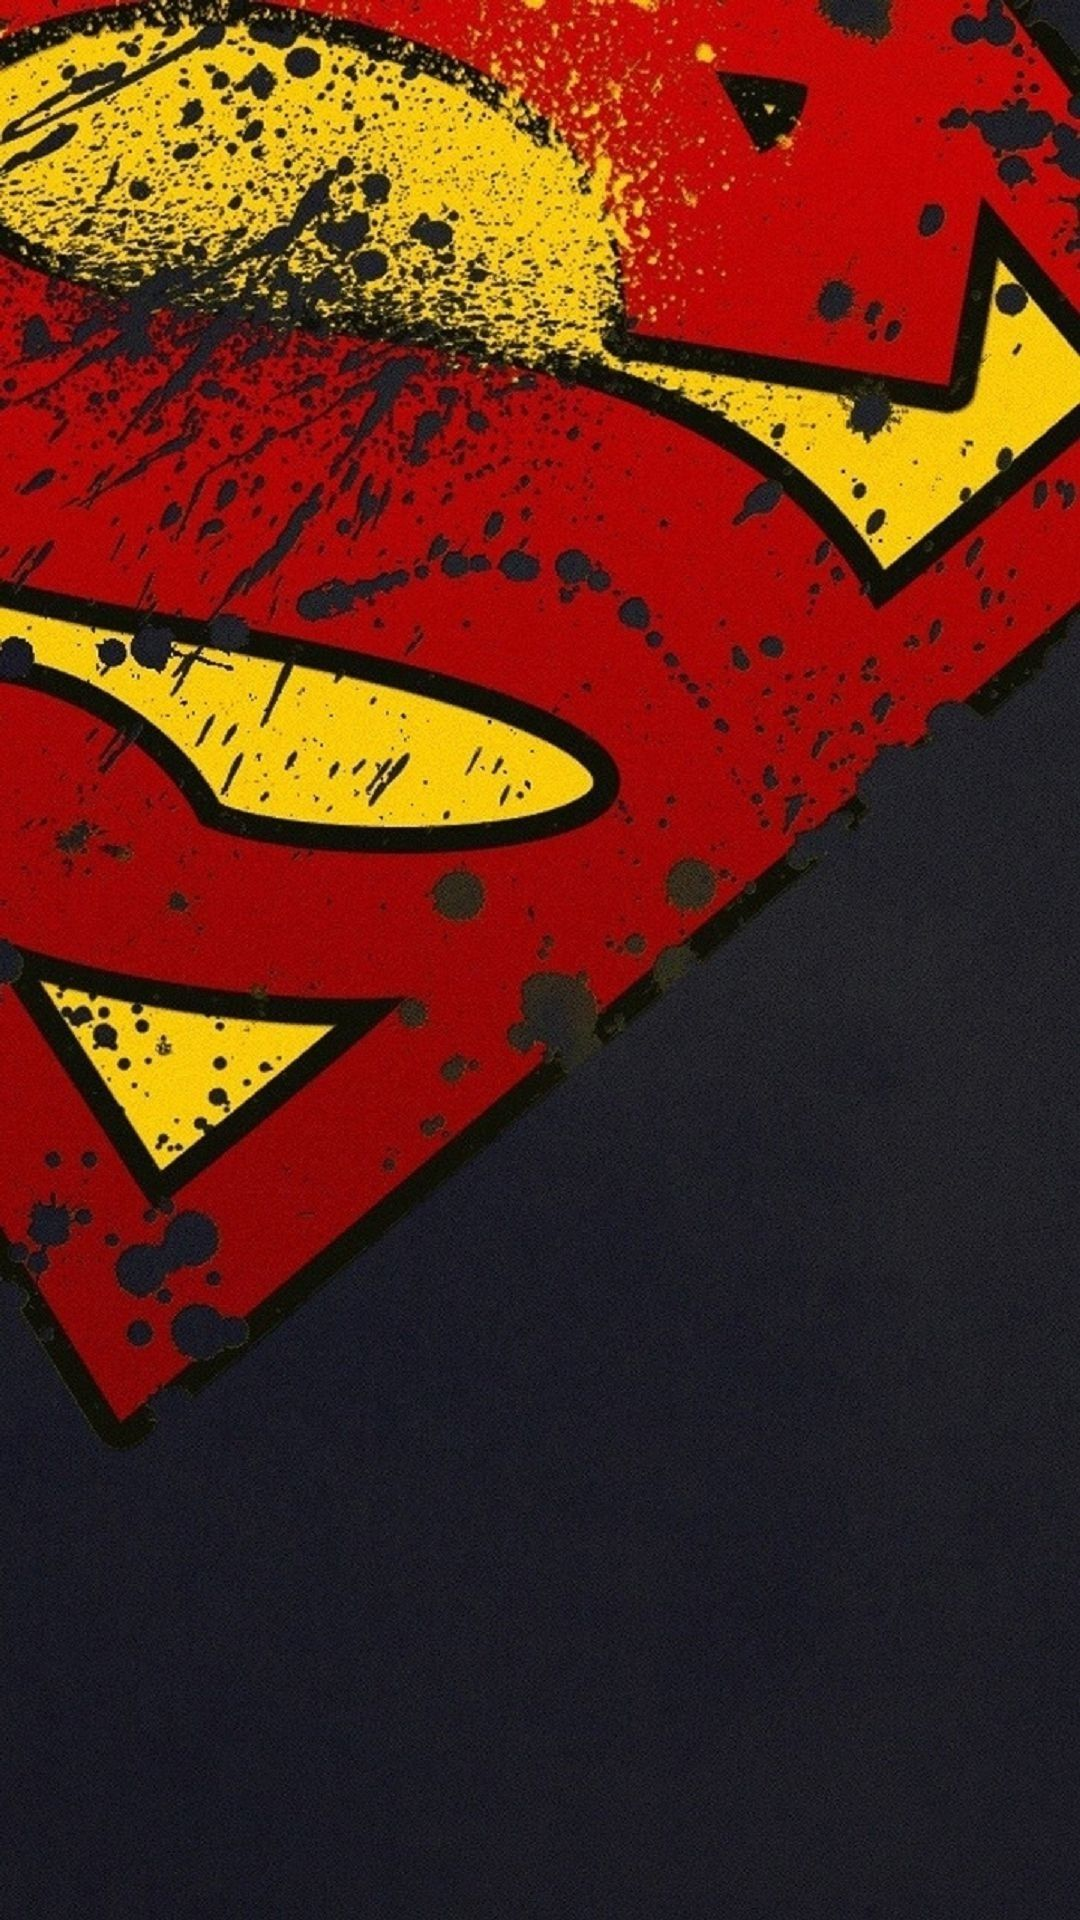 Superman Hero Superman Wallpaper Logo Superman Wallpaper Superhero Wallpaper